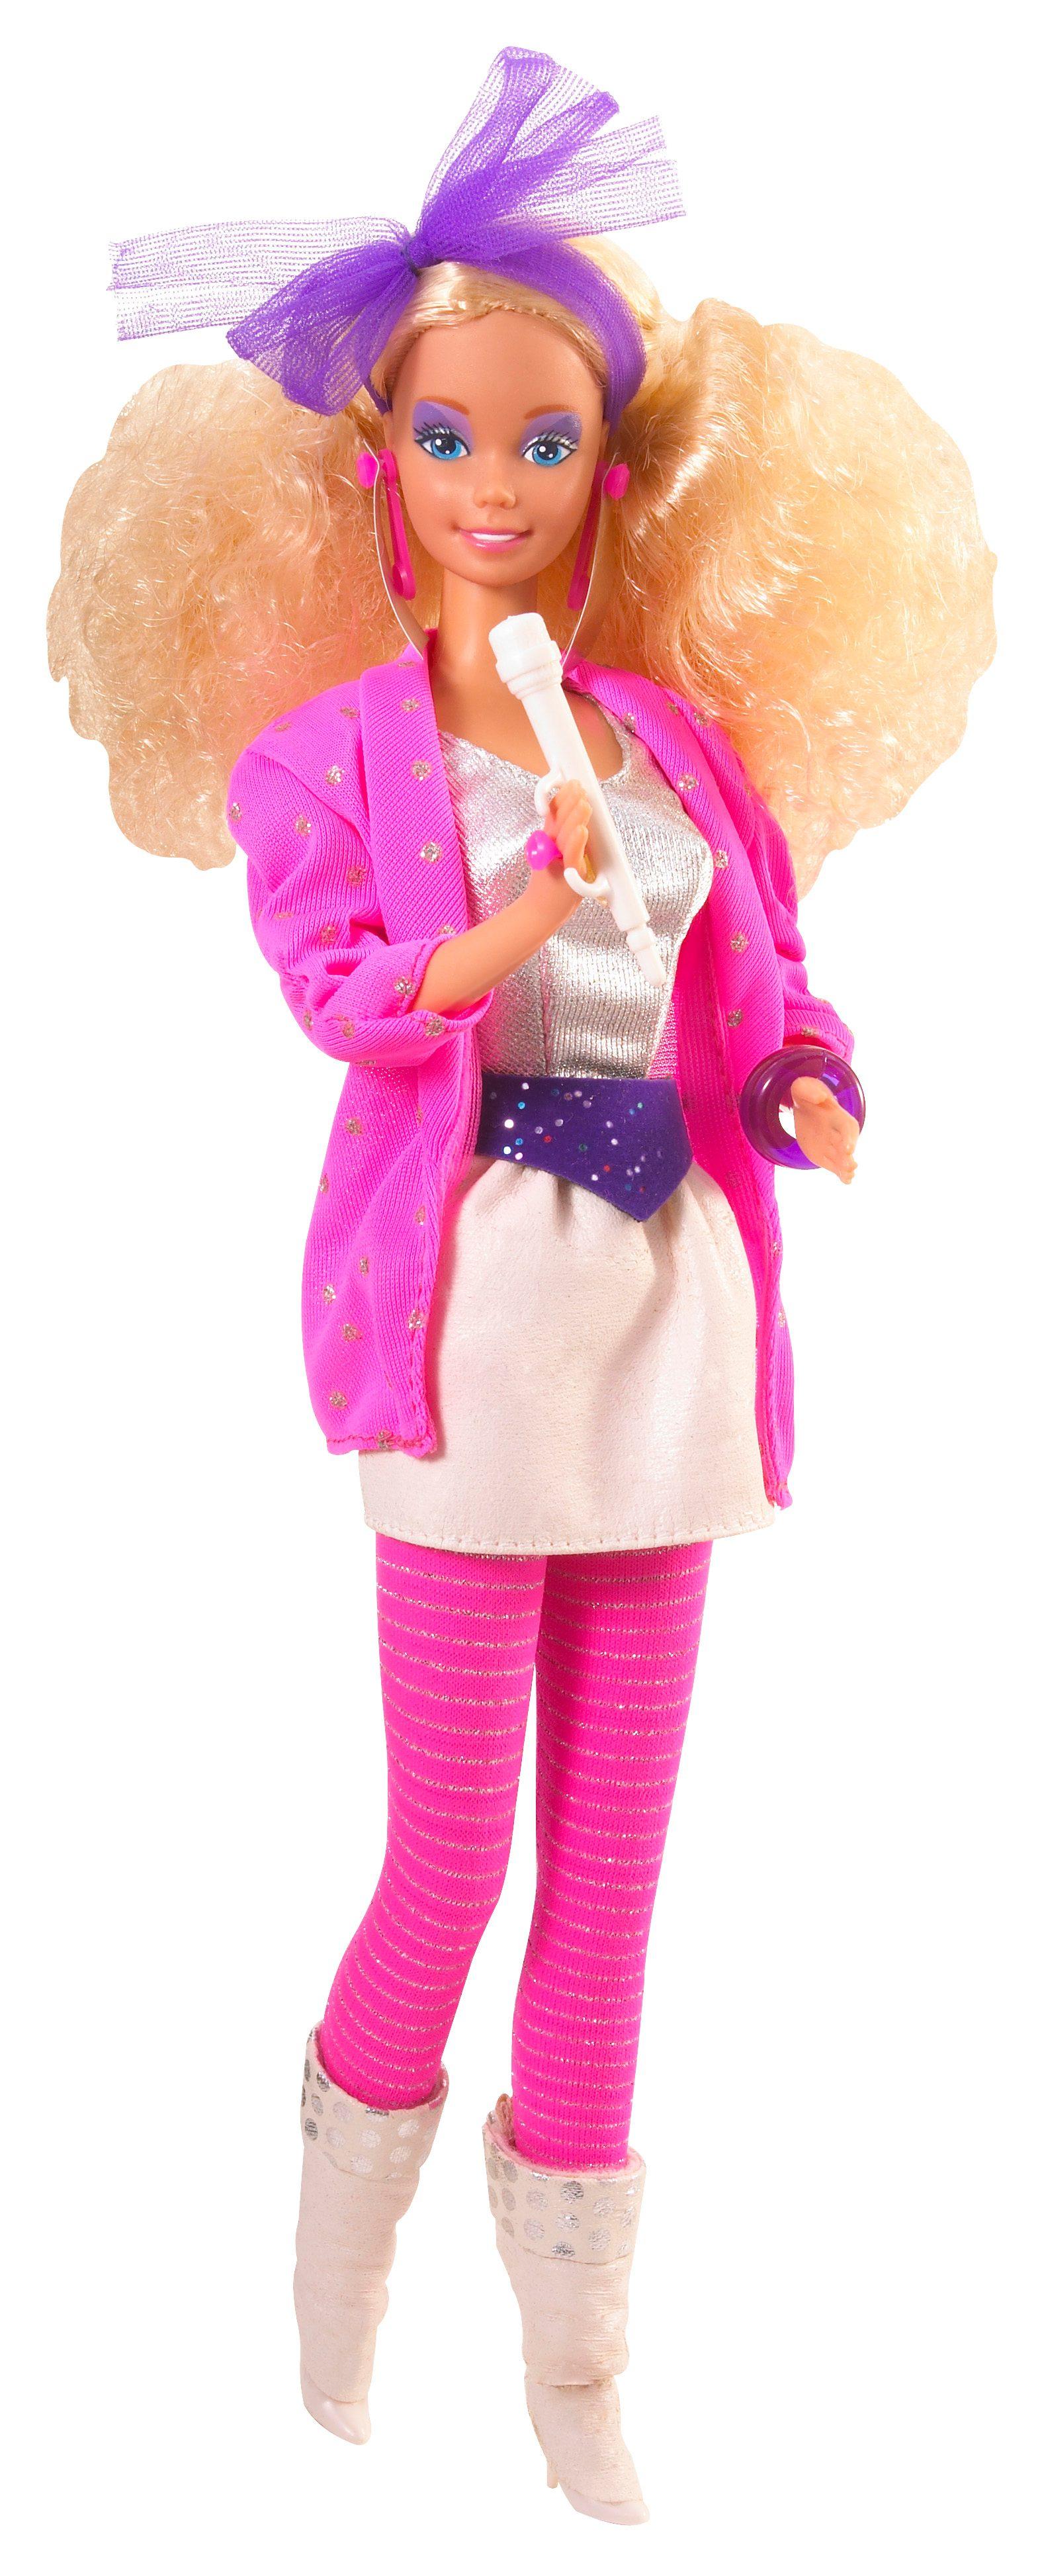 rockers barbie